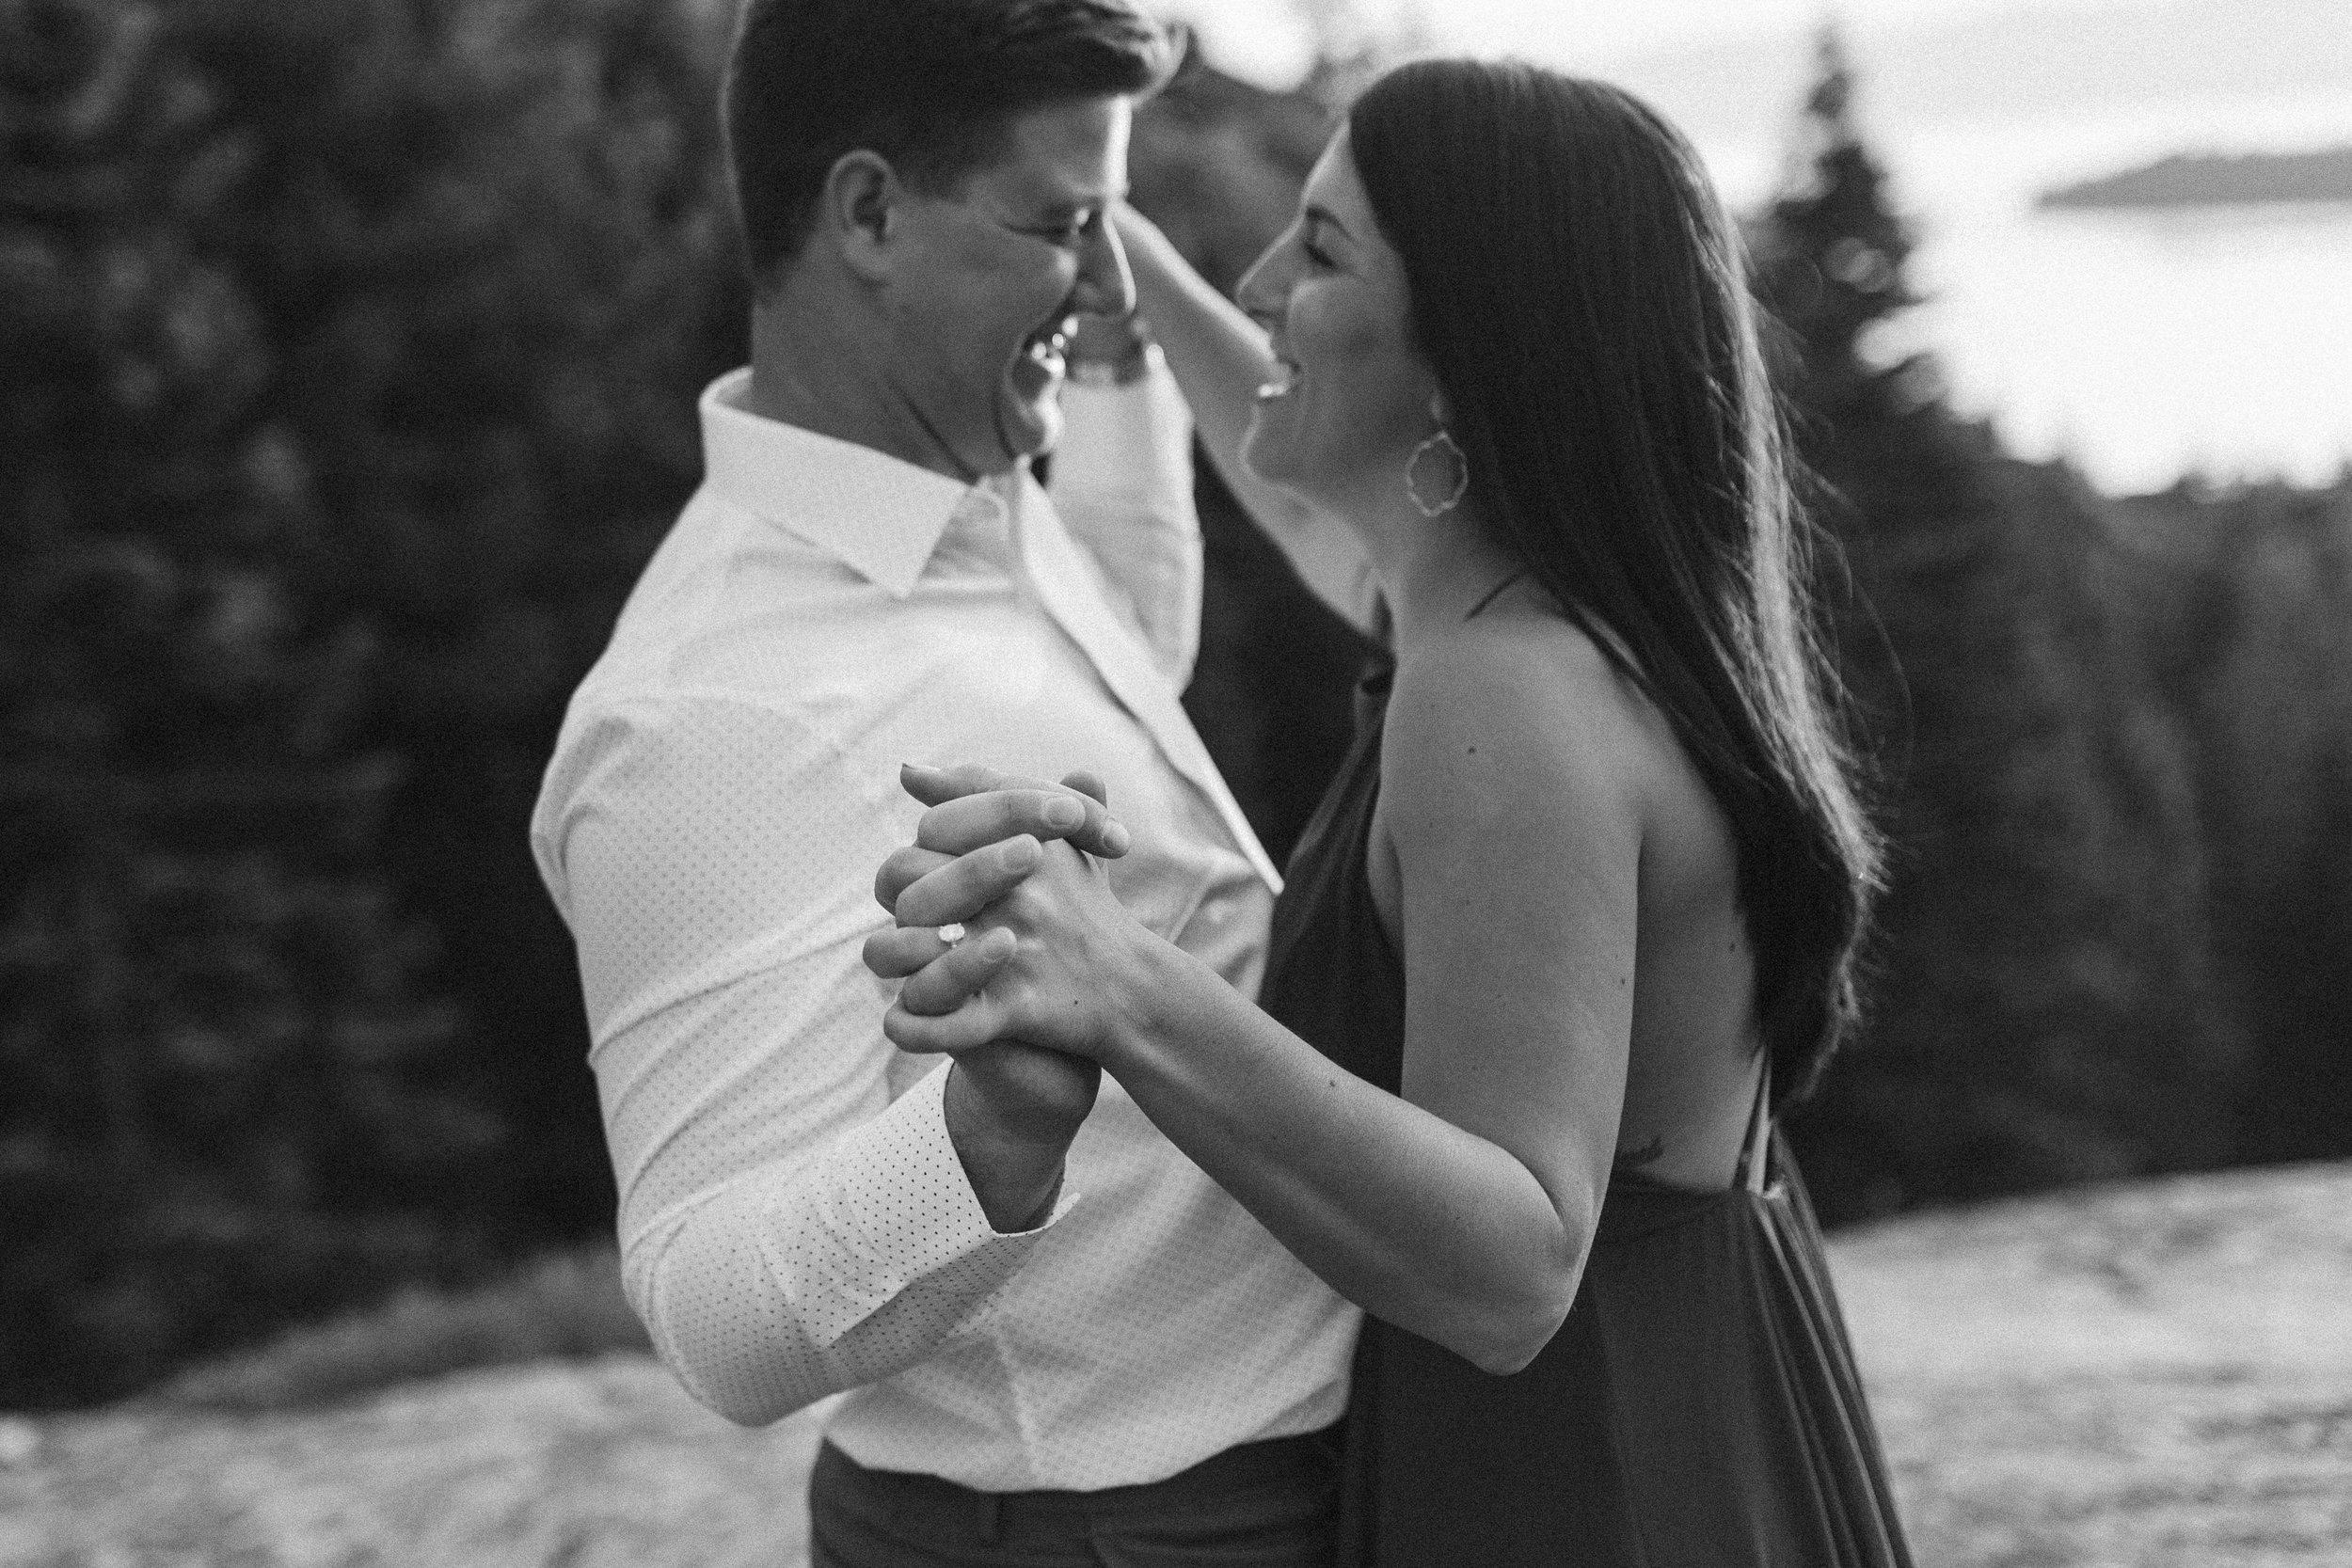 nicole-daacke-photography-lake-tahoe-sunrise-summer-adventure-engagement-photos-nevada-wedding-elopement-photographer-golden-emerald-bay-light-pine-trees-summer-vibe-fun-carefree-authentic-love-25.jpg